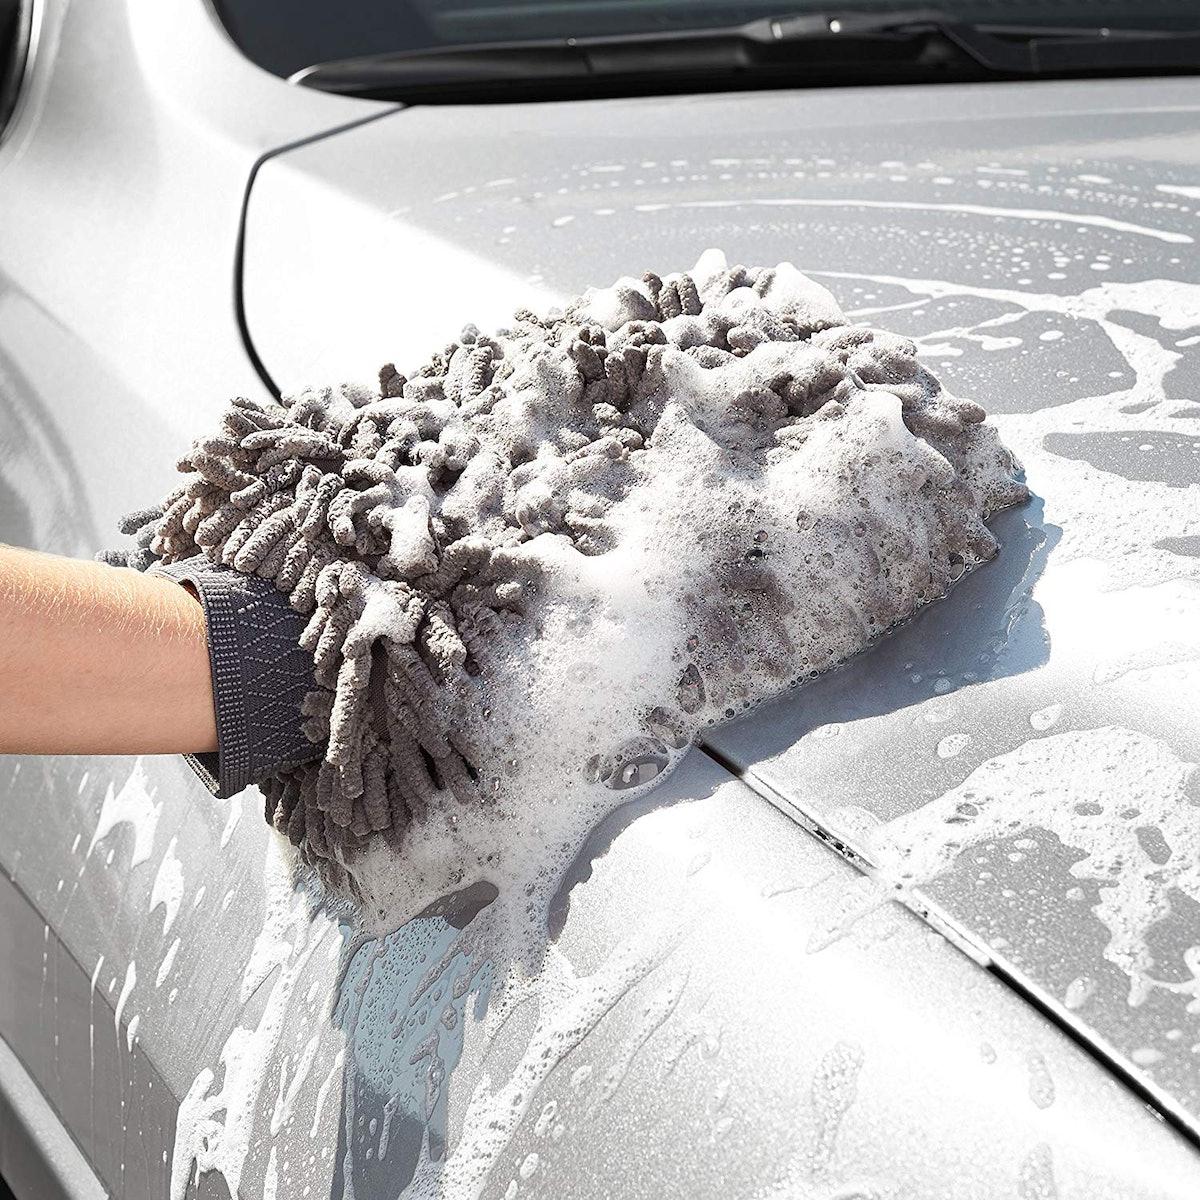 AmazonBasics Deluxe Microfiber Car Wash Mitt (2 Pack)